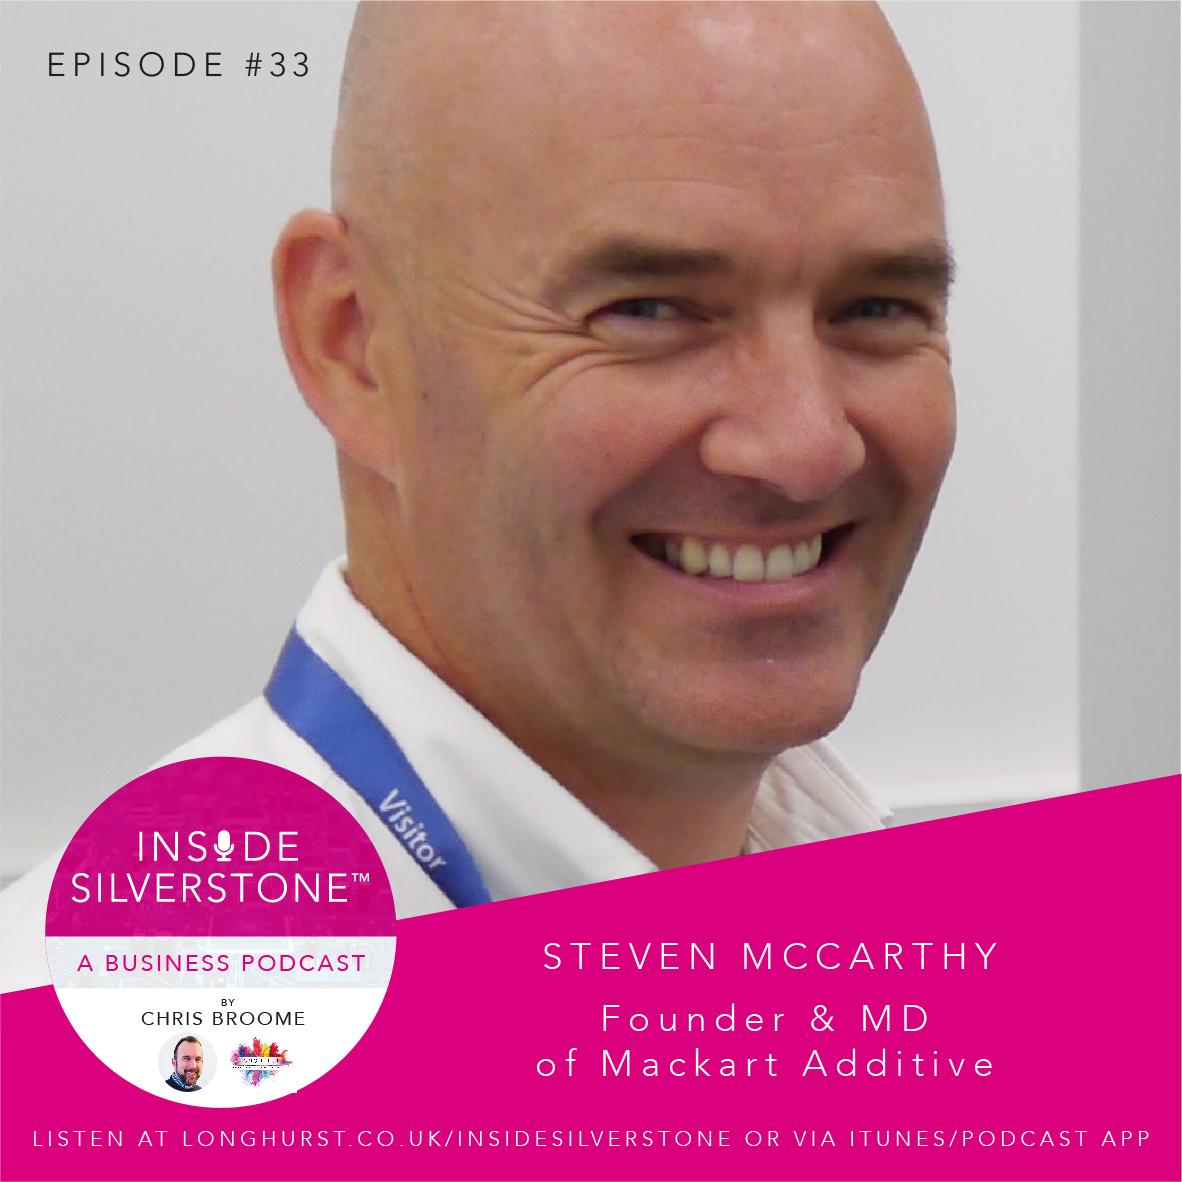 Steven McCarthy - Founder & MD of Mackart Additive